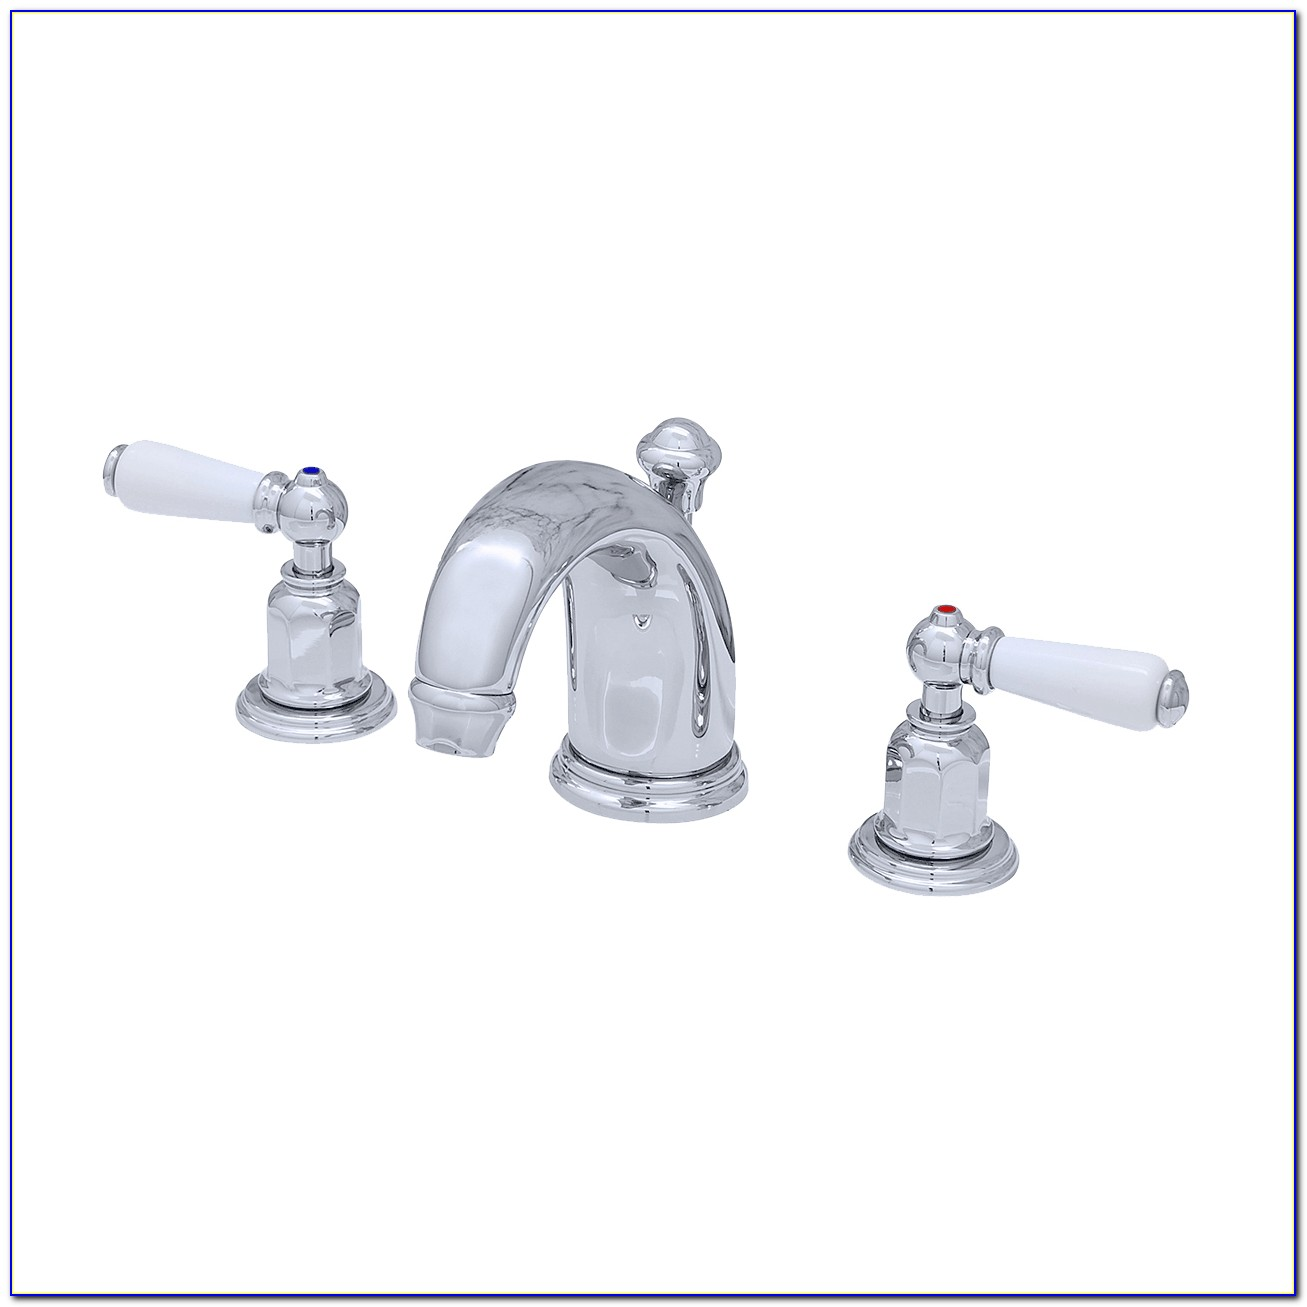 Perrin And Rowe Bathroom Taps Uk